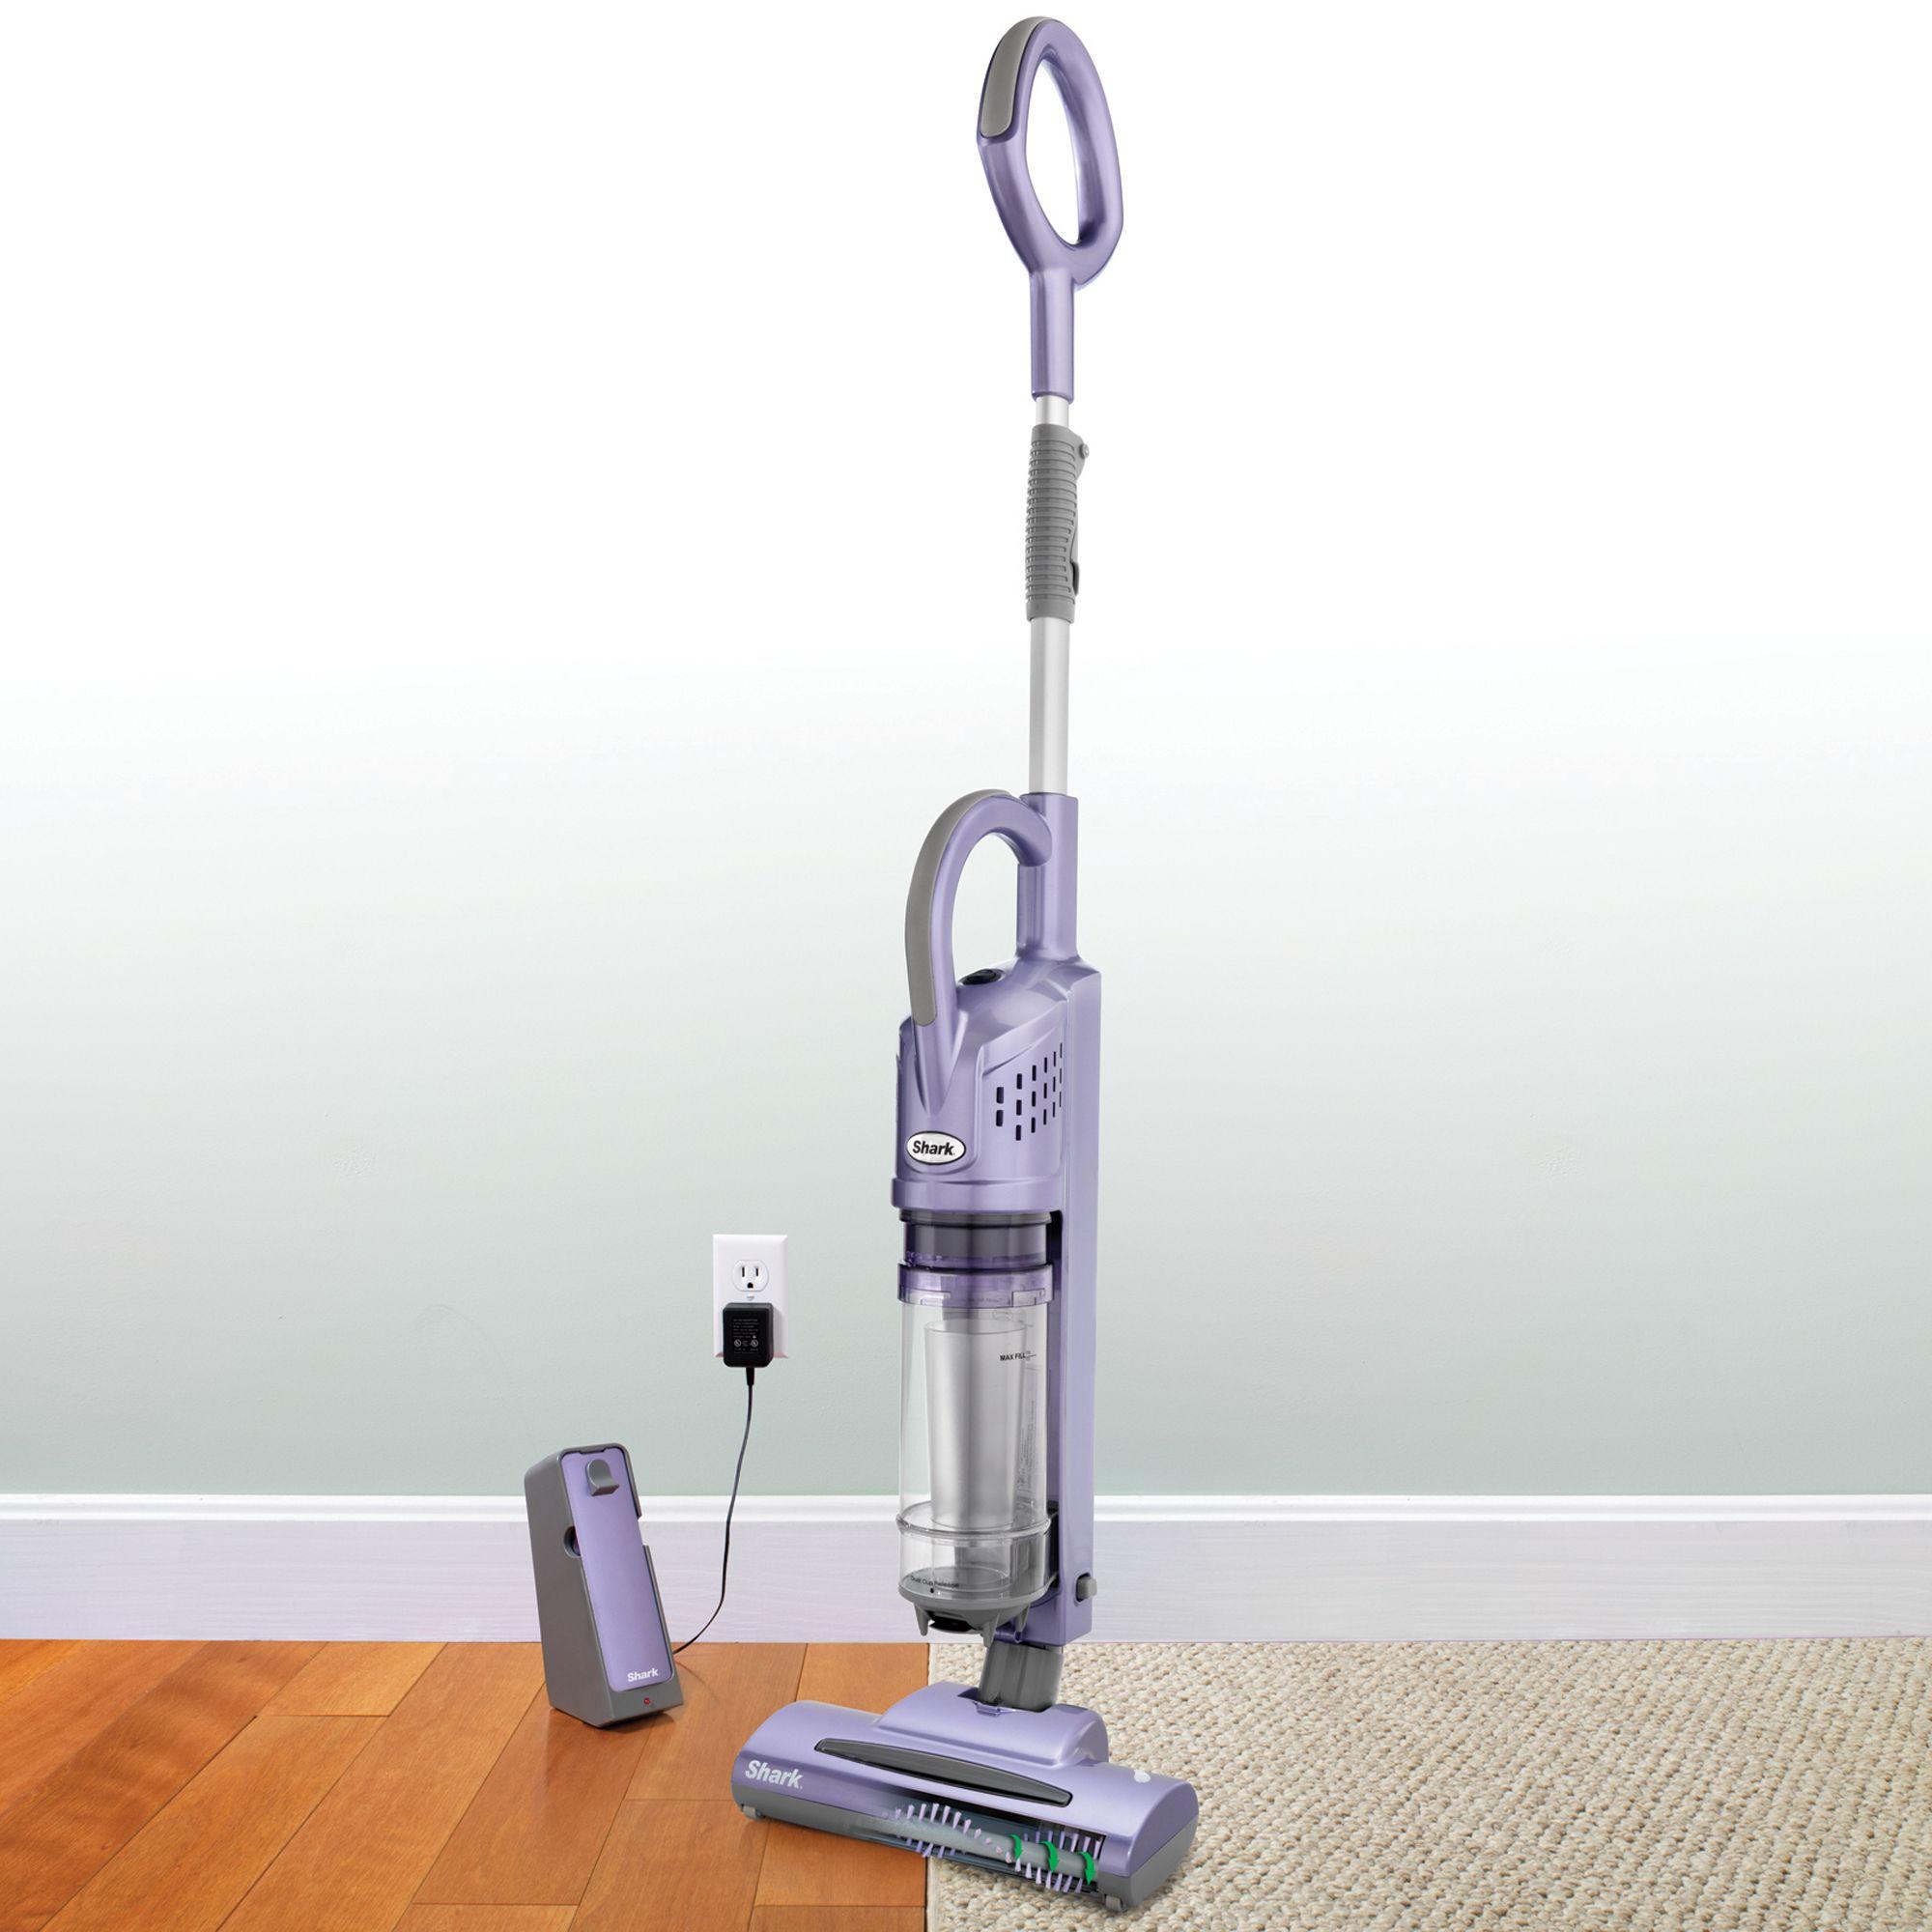 Stick Cordless Bagless Vacuum